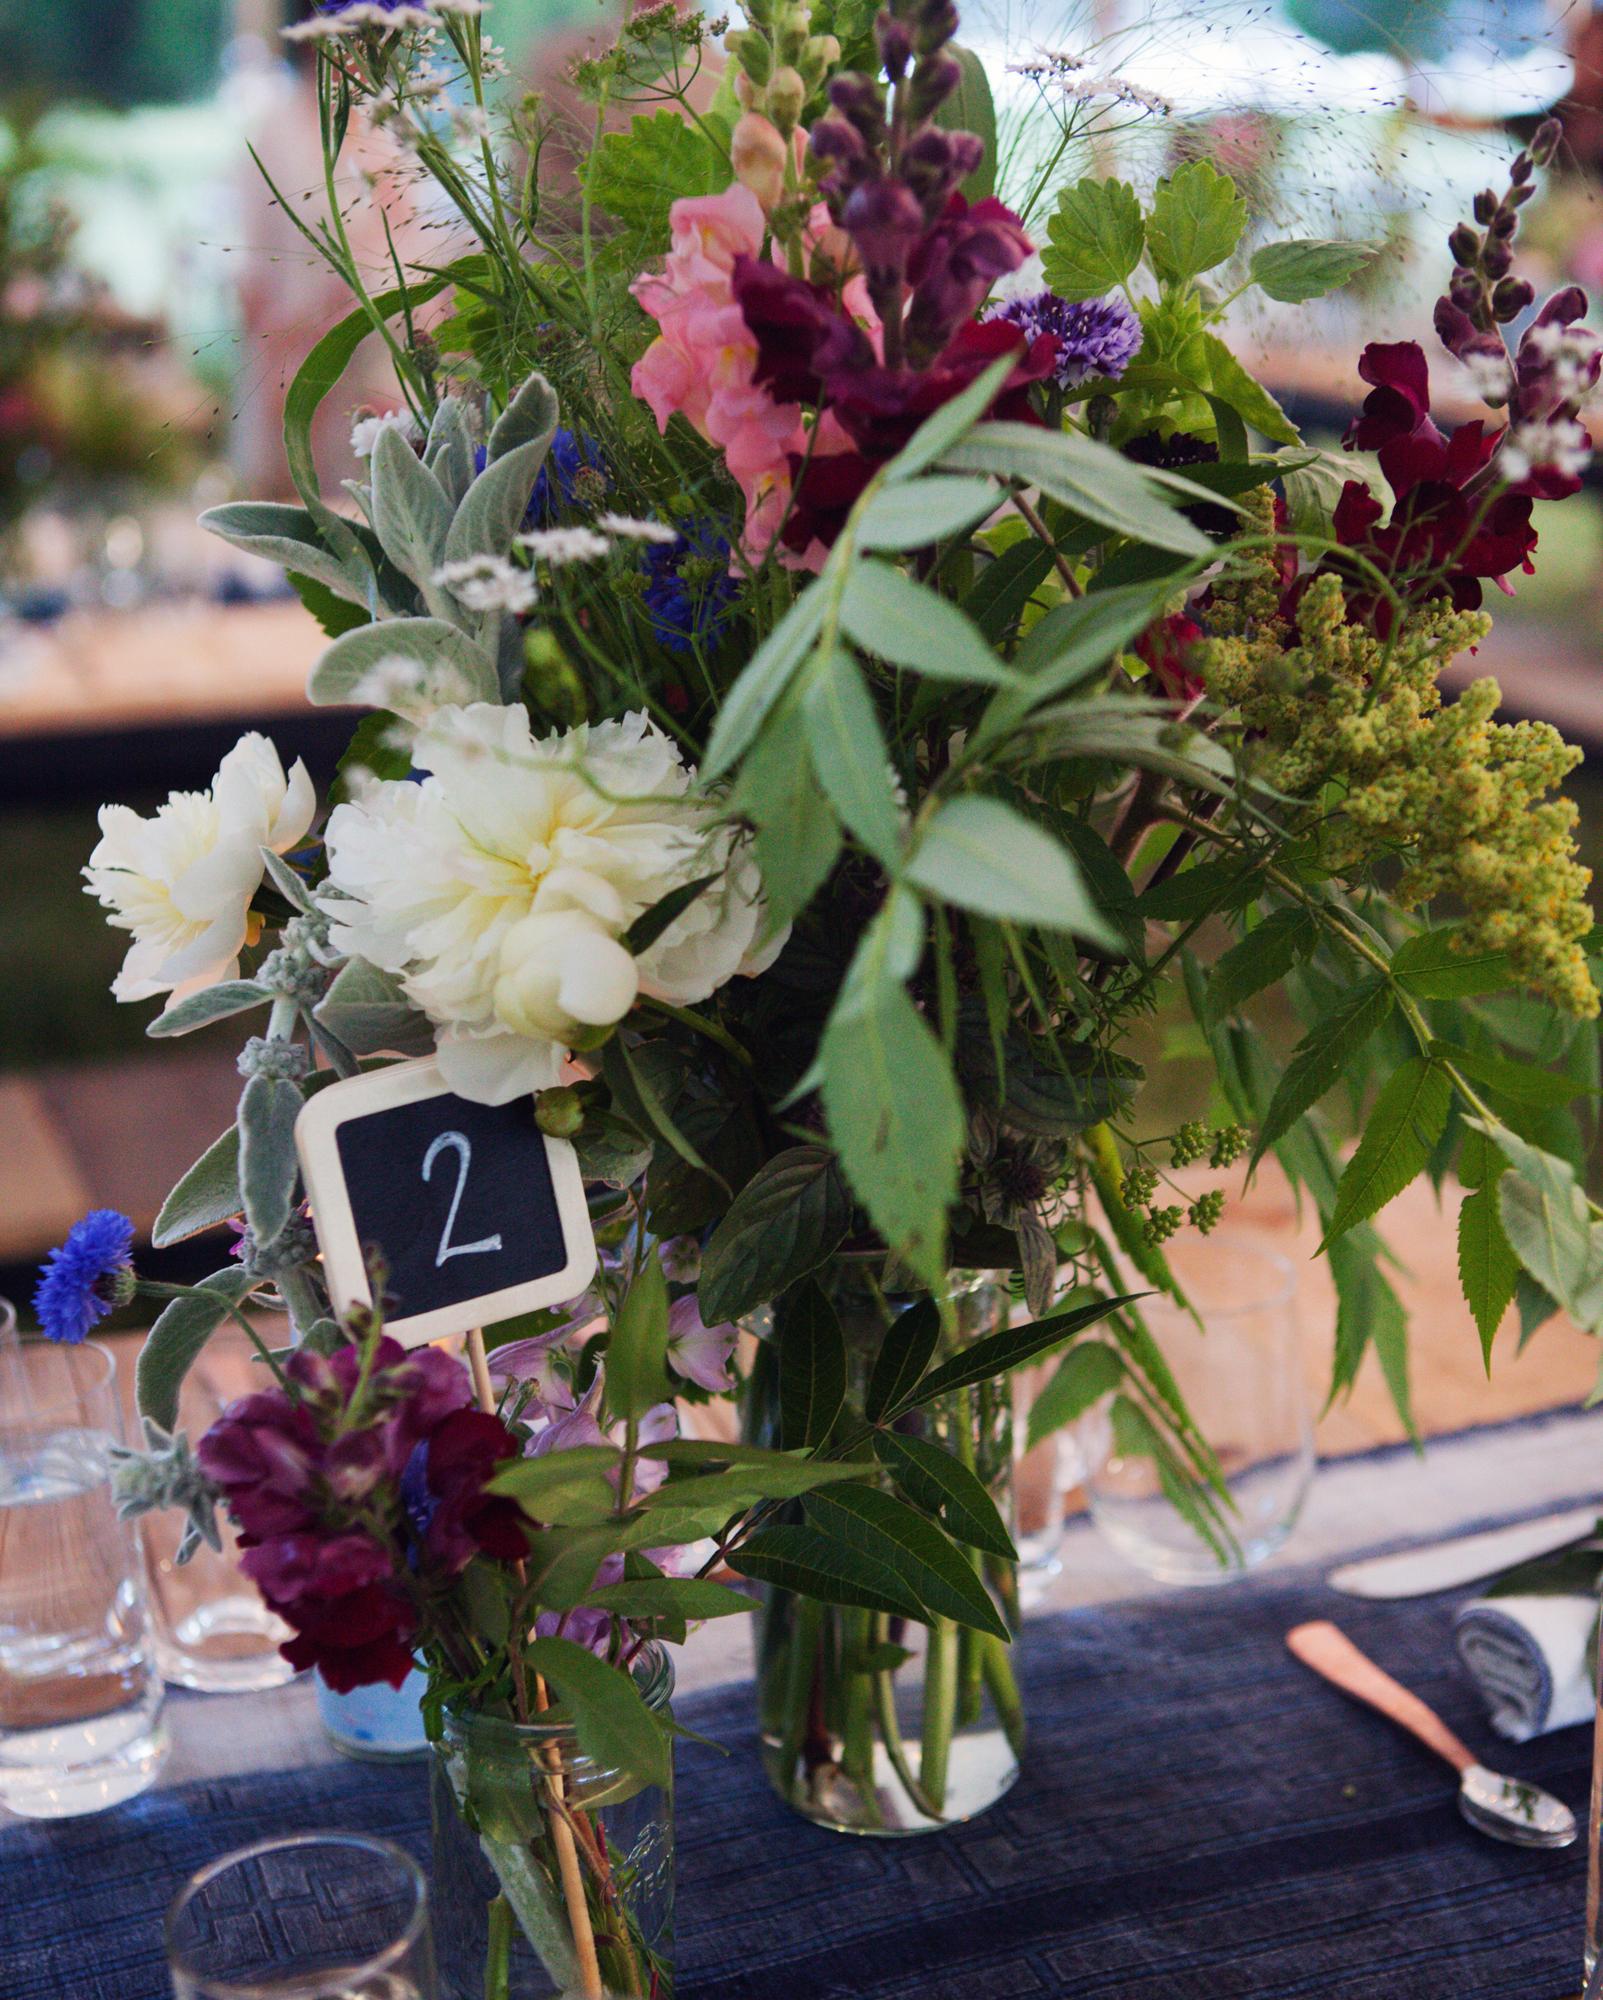 lilly-carter-wedding-tablenumber-00572-s112037-0715.jpg